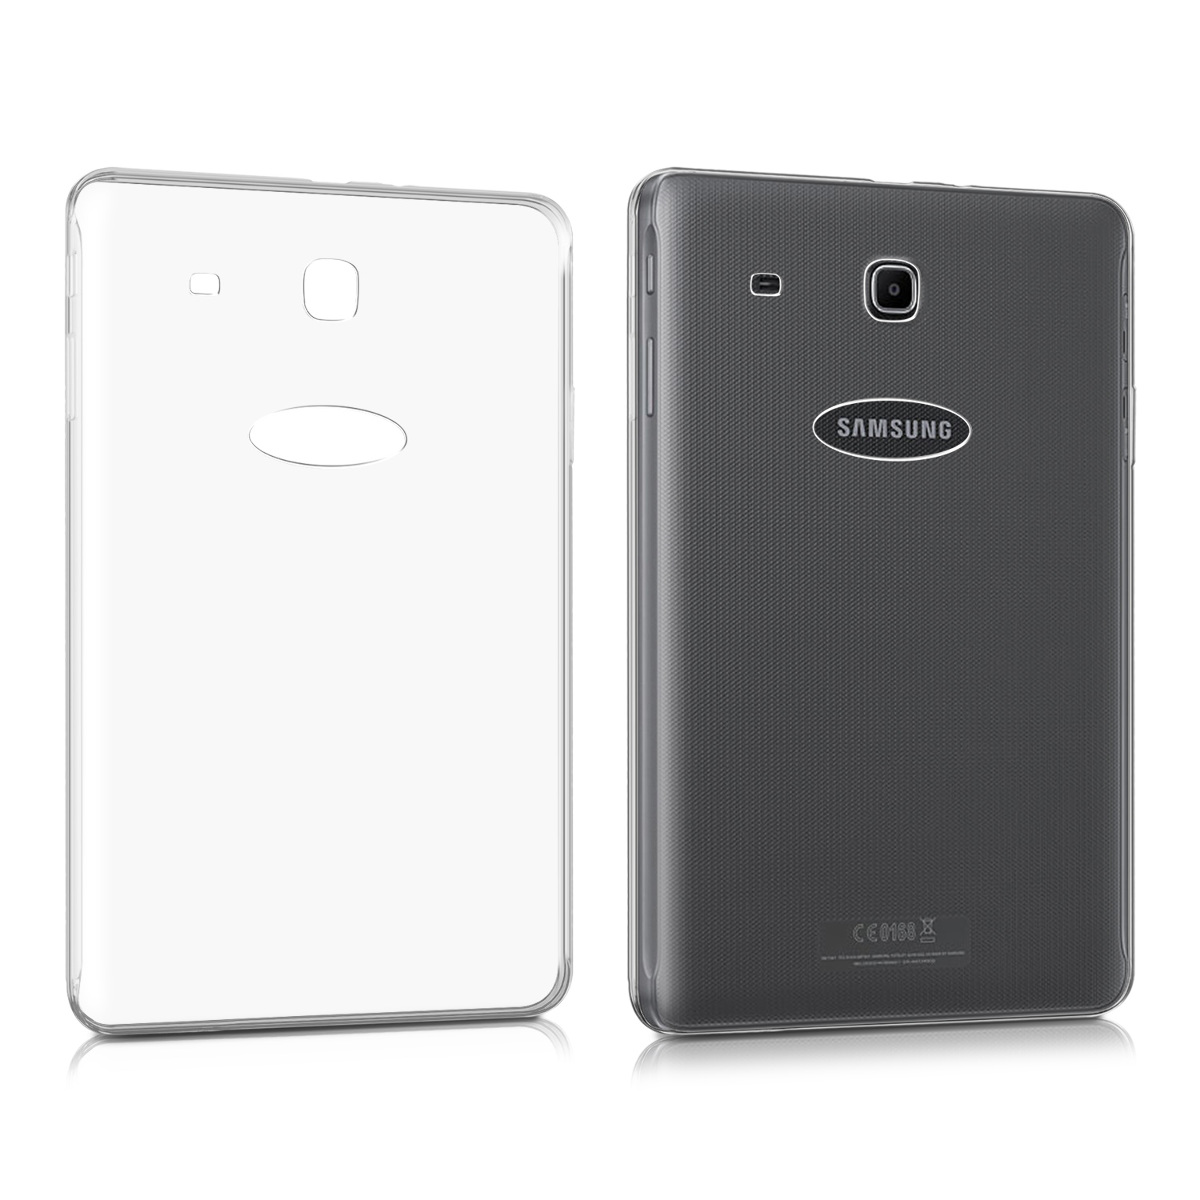 KW Θήκη Σιλικόνης  Samsung Galaxy Tab E 9.6'' - Transparent (37437.03)